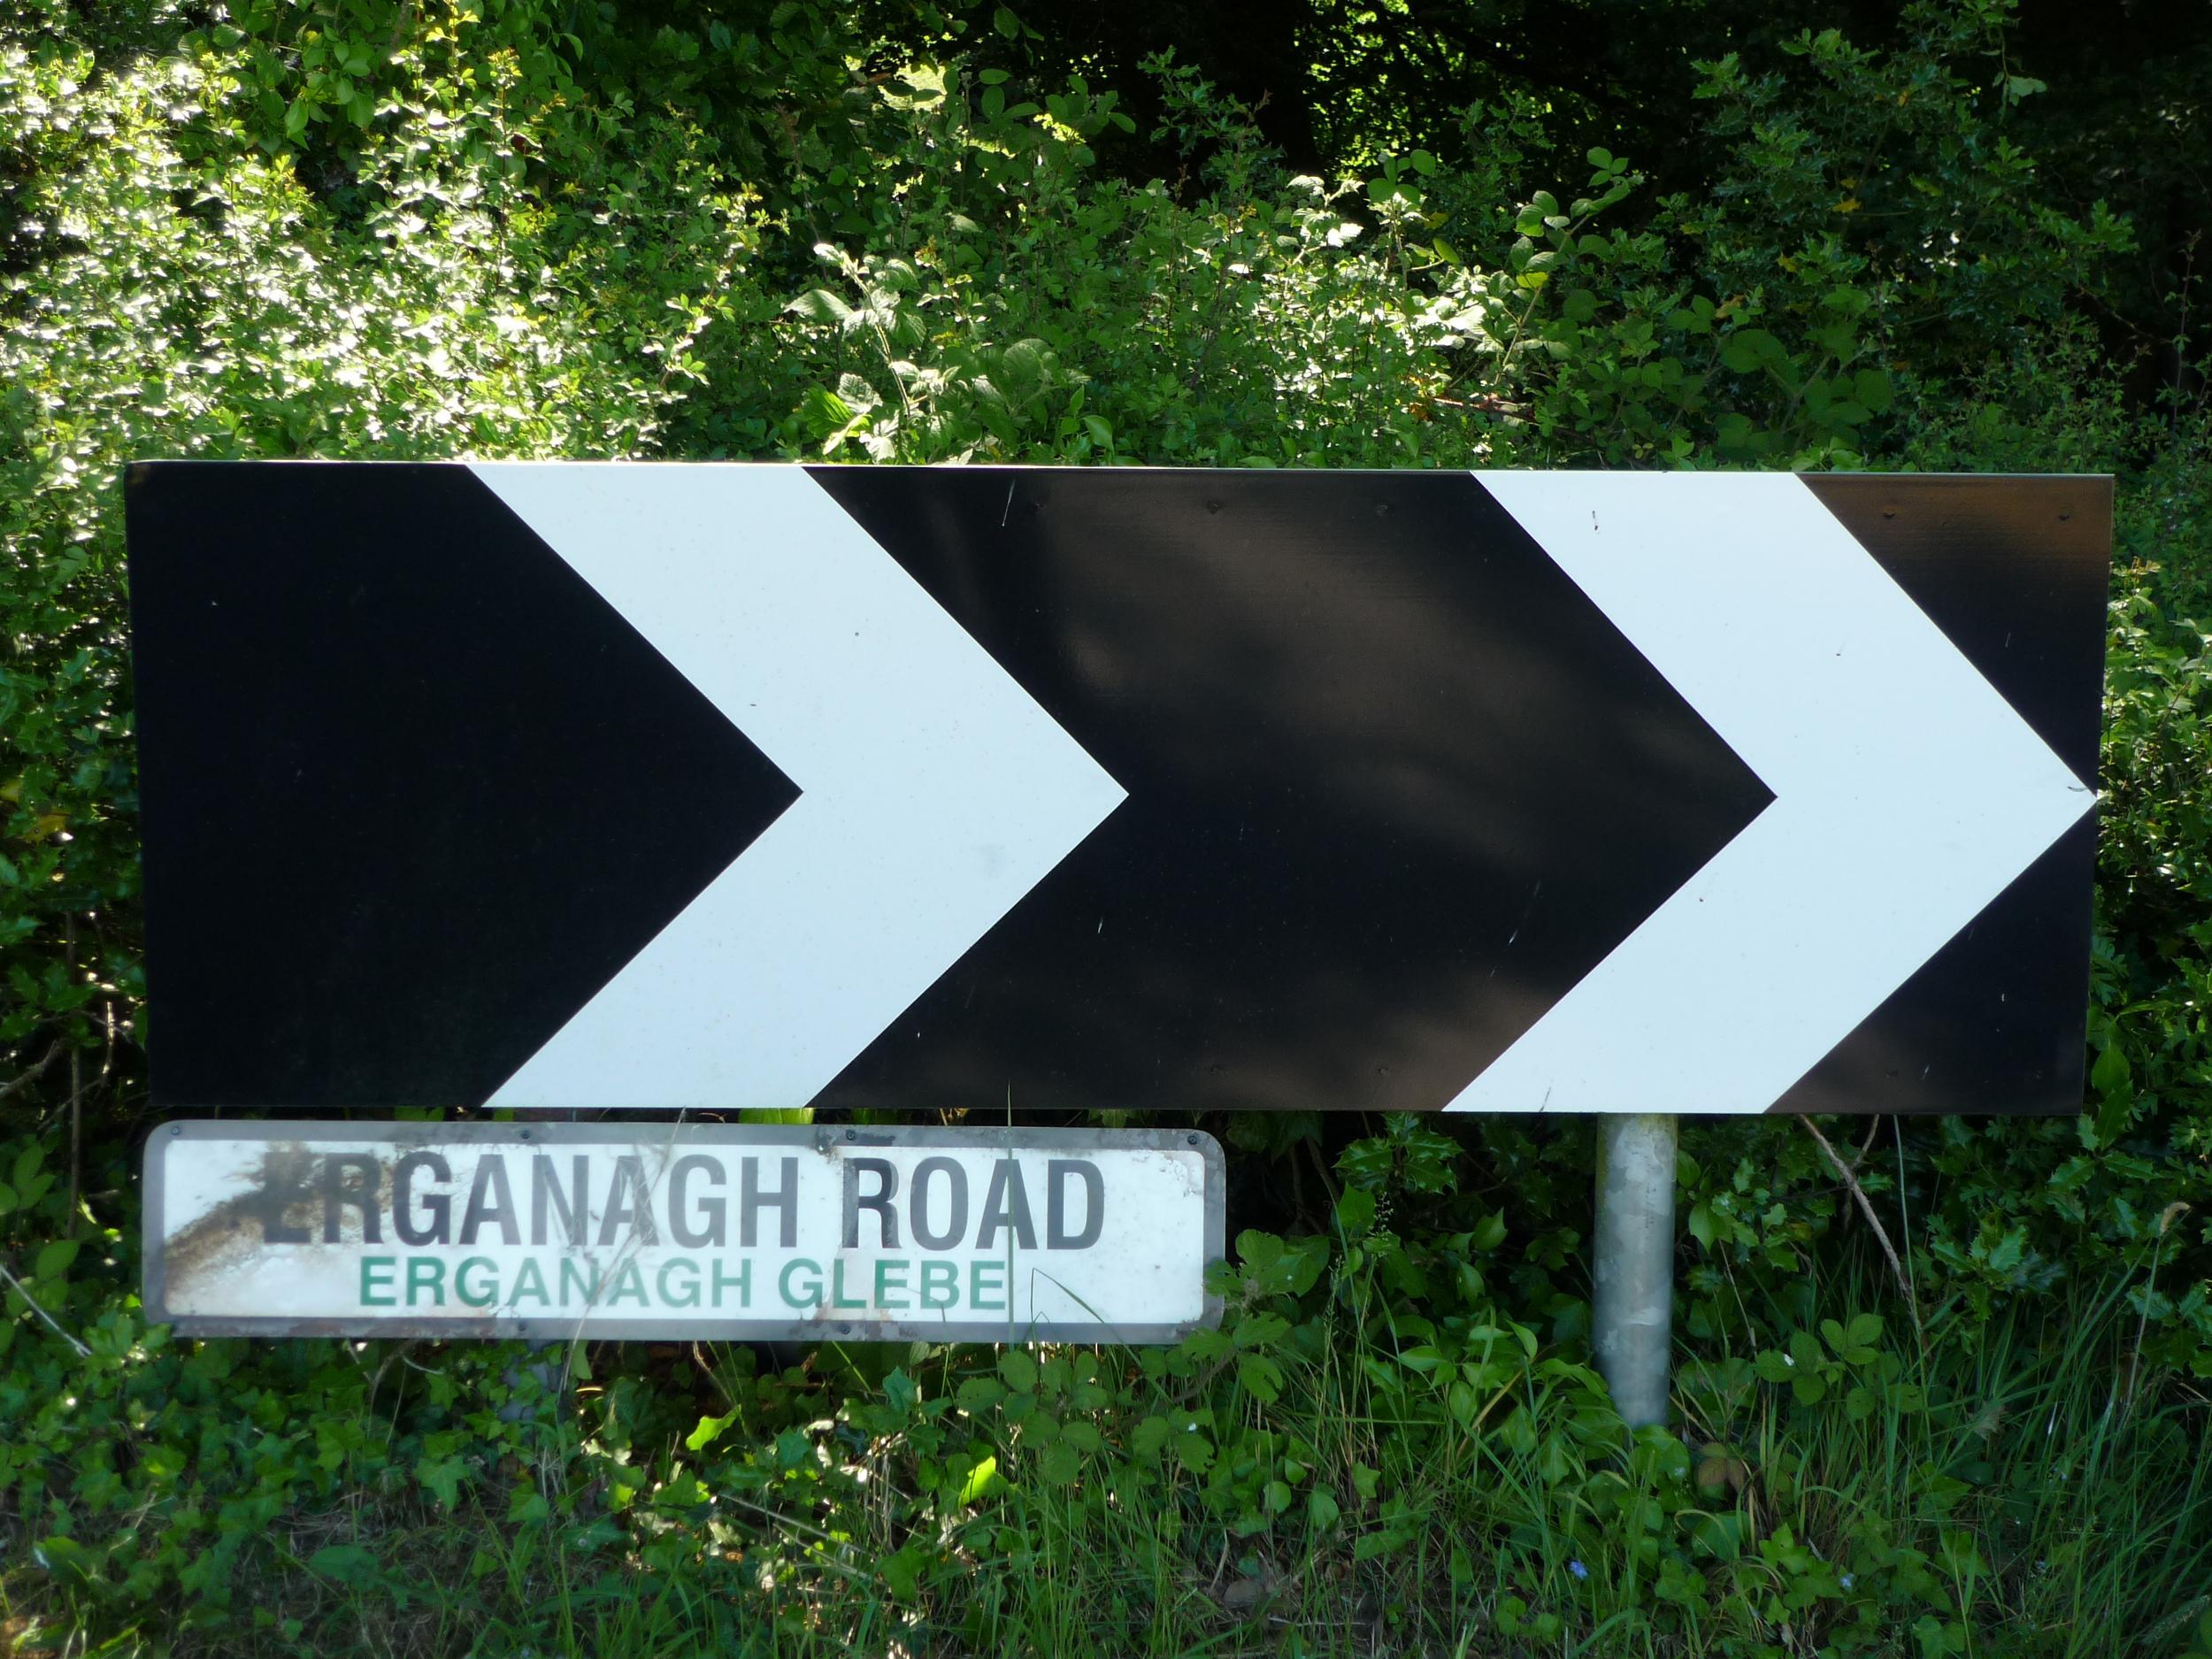 Erganagh Road/ Glebe Road Sign